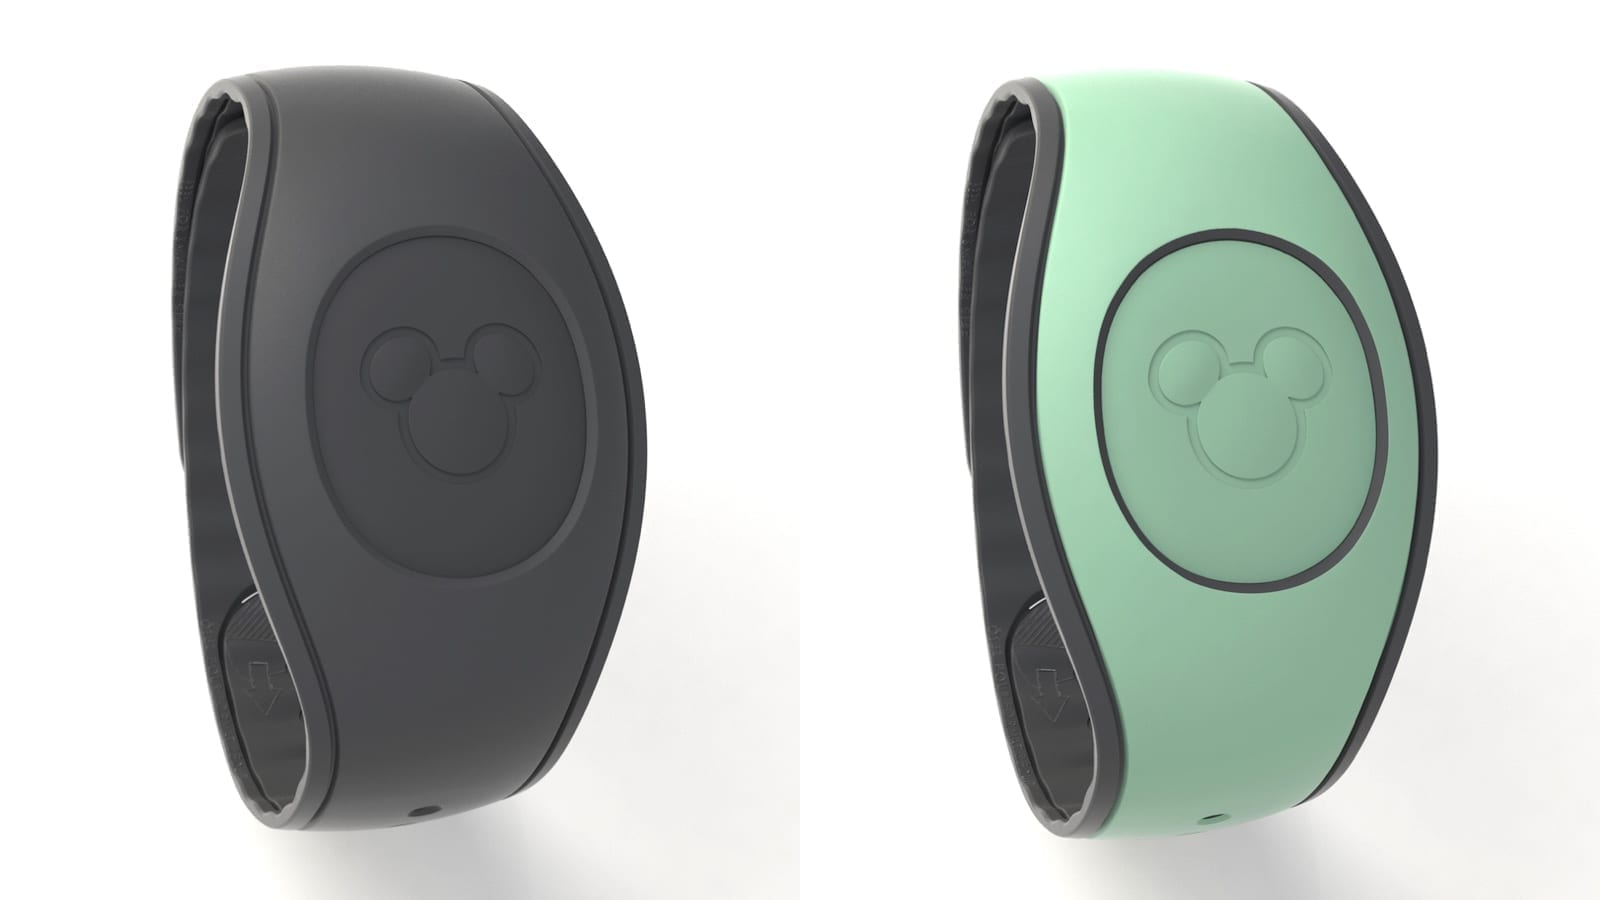 New MagicBand Colors Arriving at Walt Disney World Resort